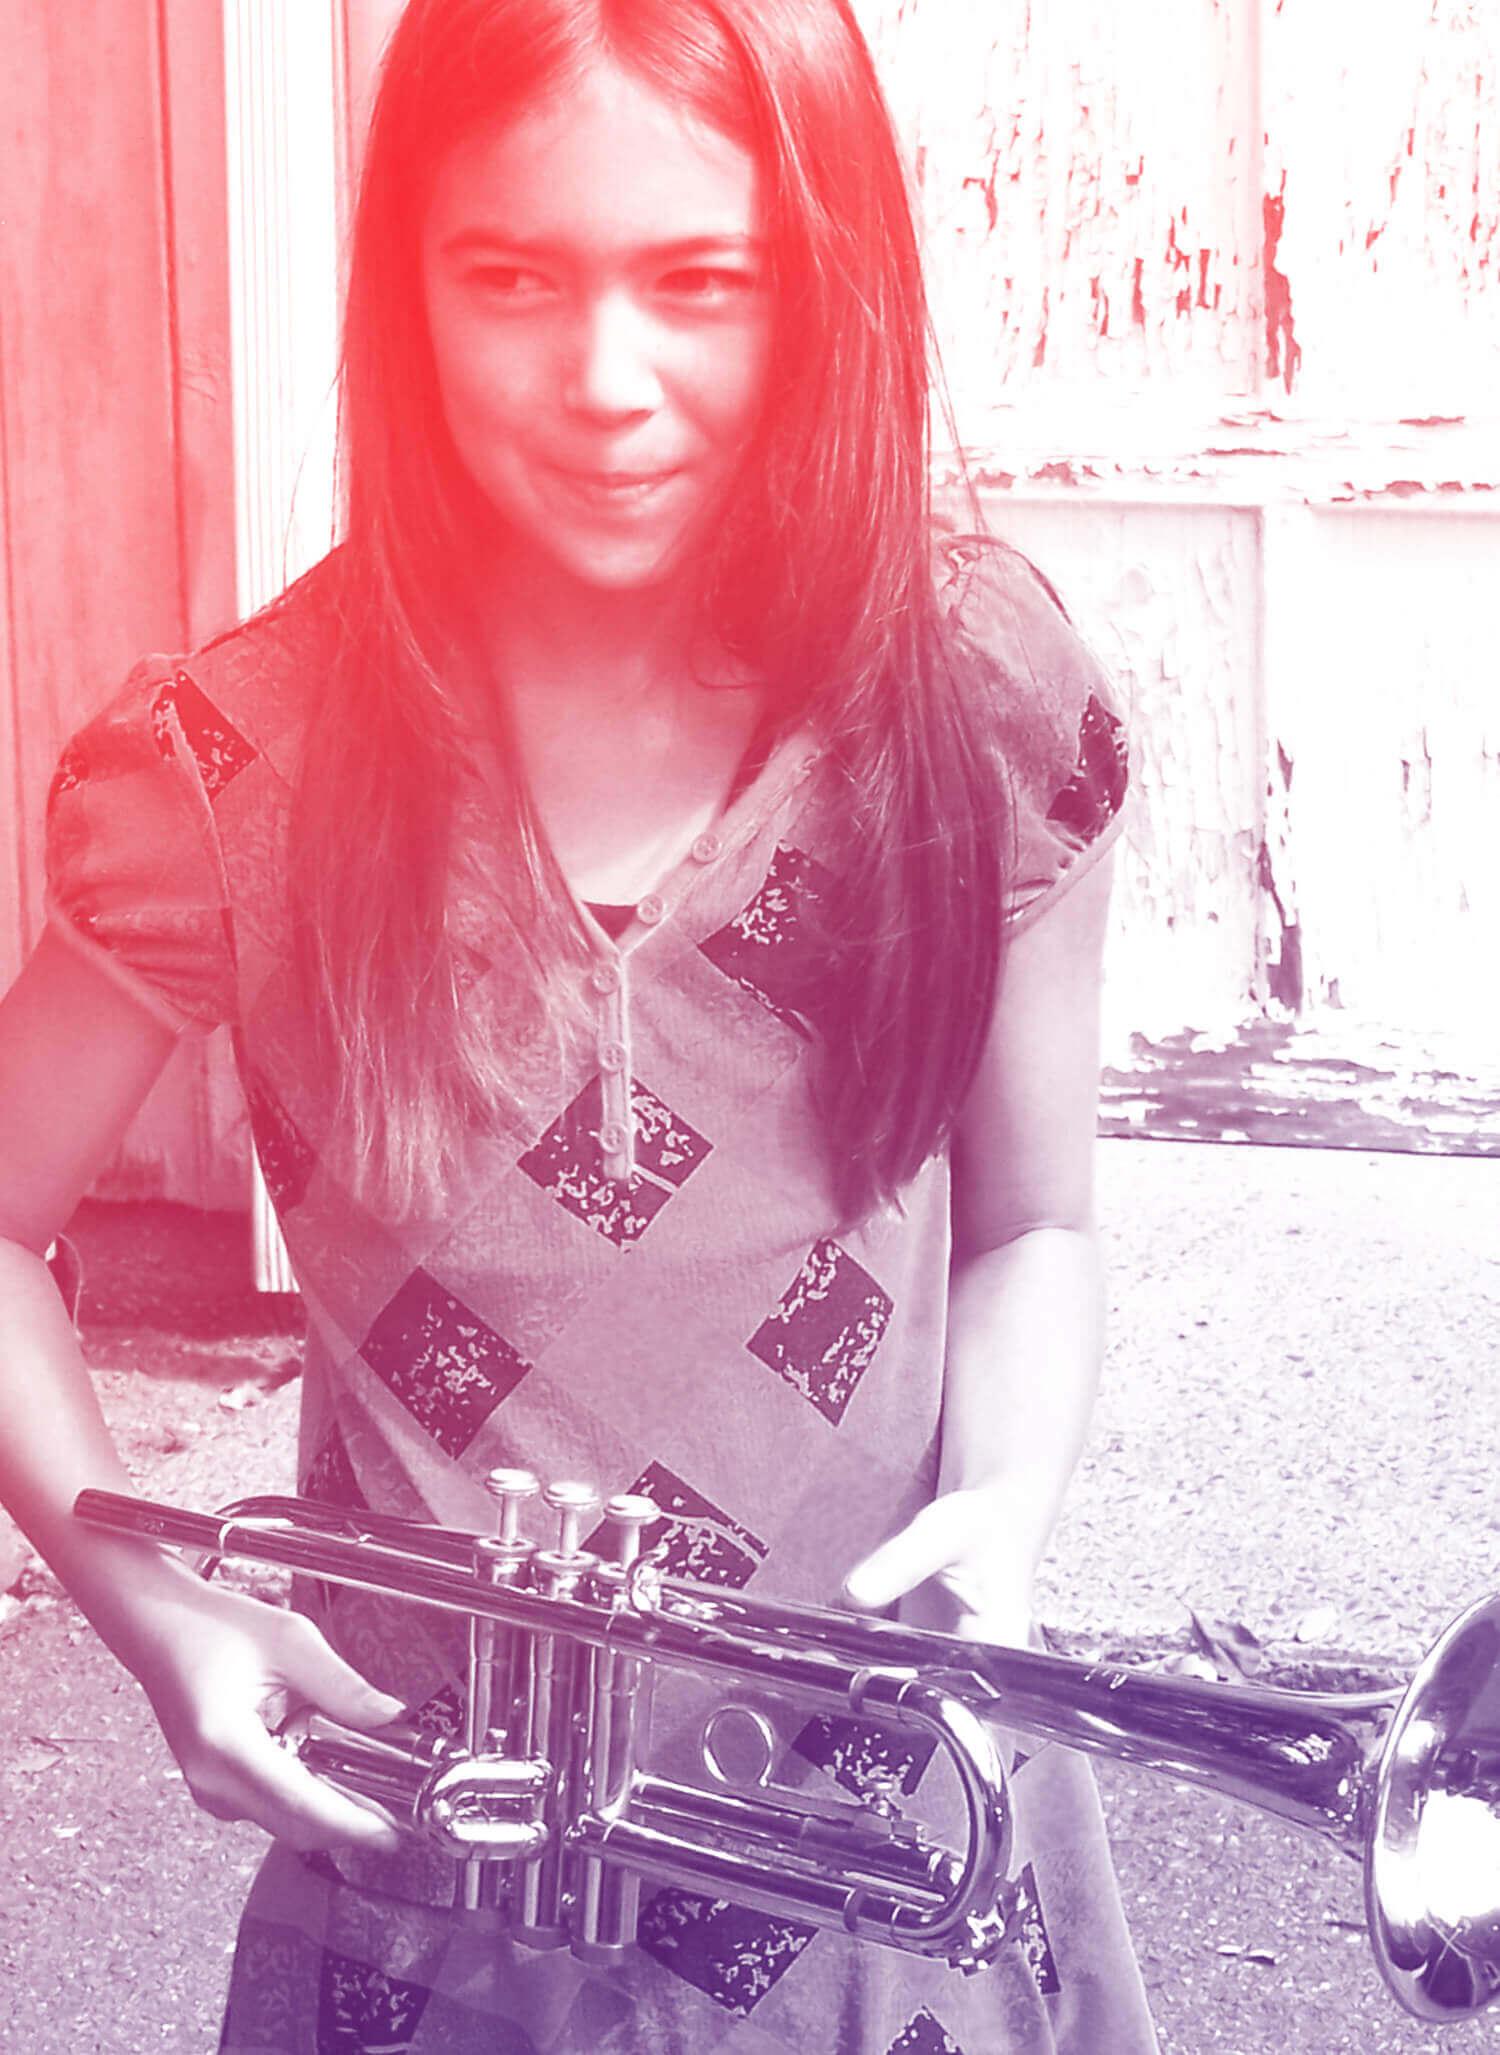 MUSARY_deckimages_LONG_070916_V2_trumpet_girl